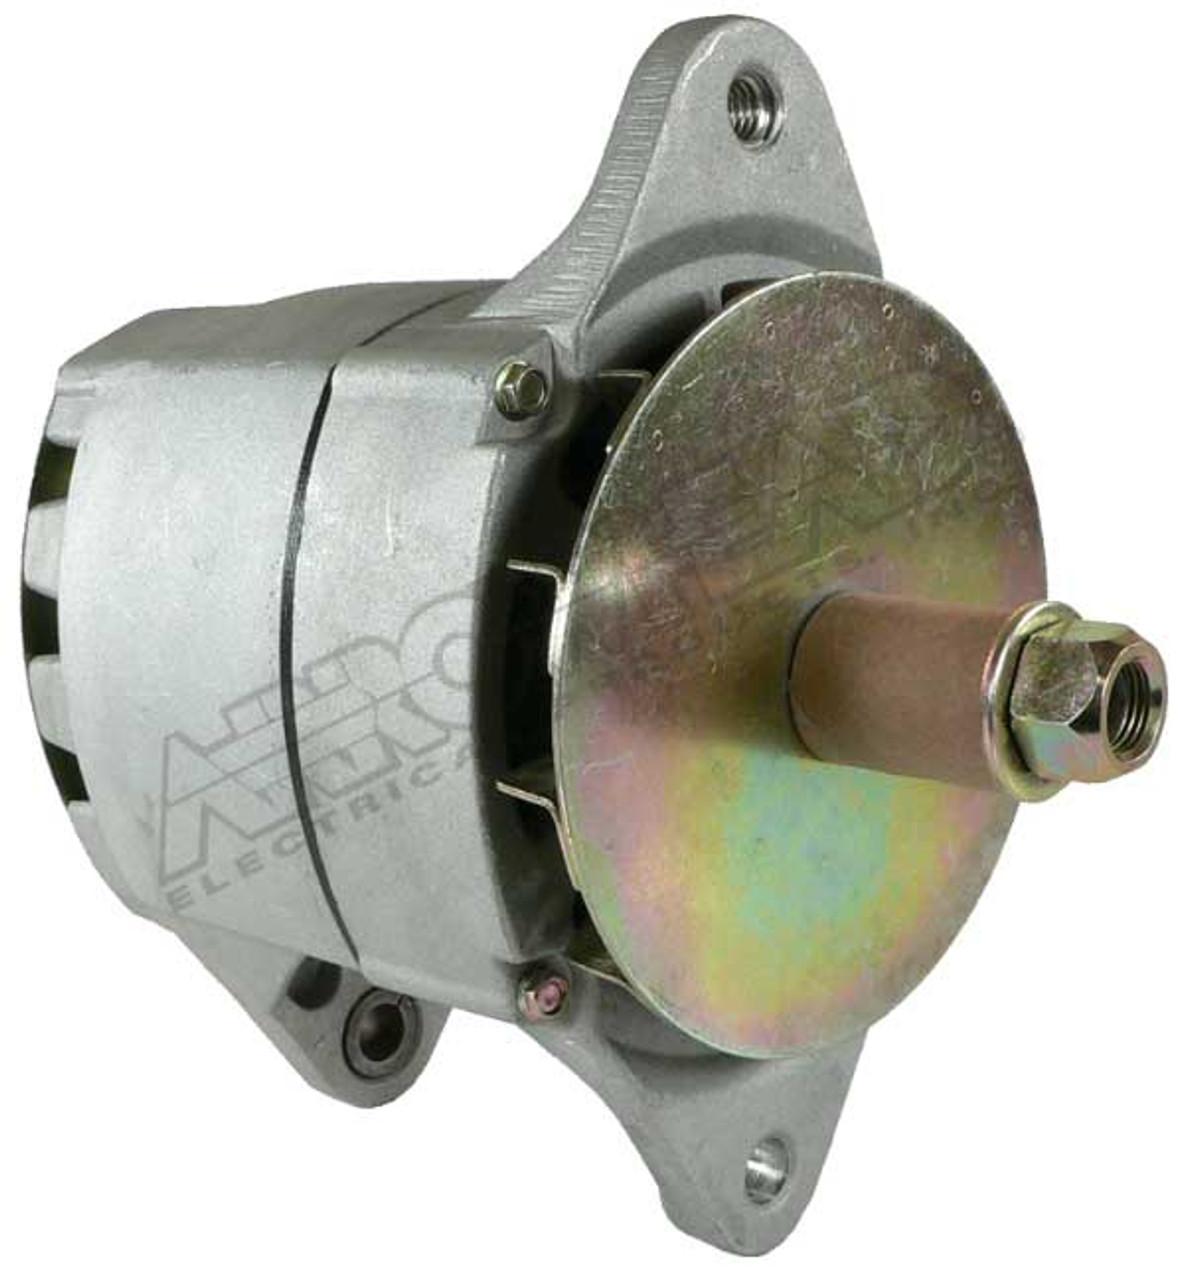 Alternator for 20SI Series IR/EF, 24-Volt, 45 Amp